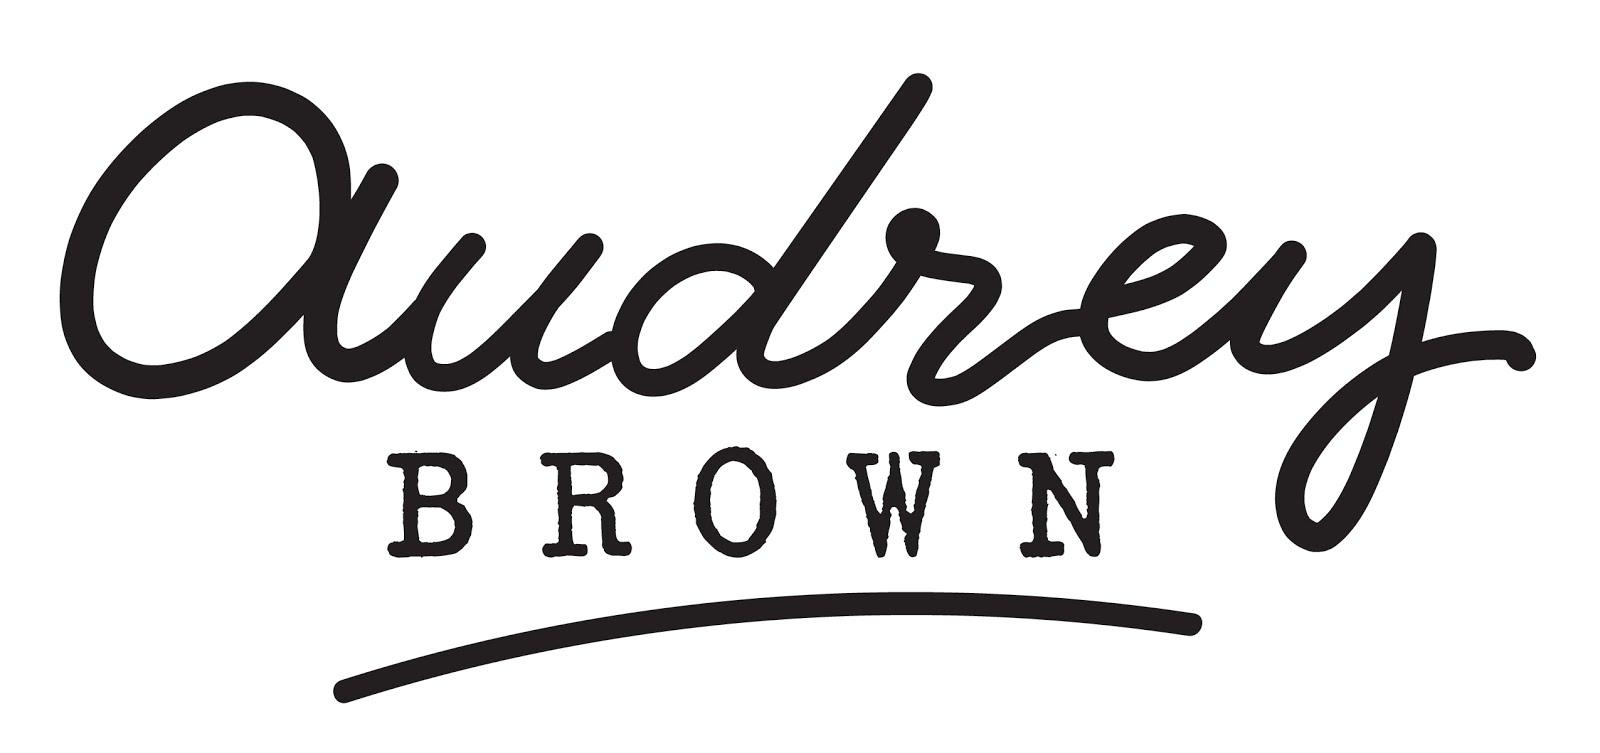 Audrey Brown